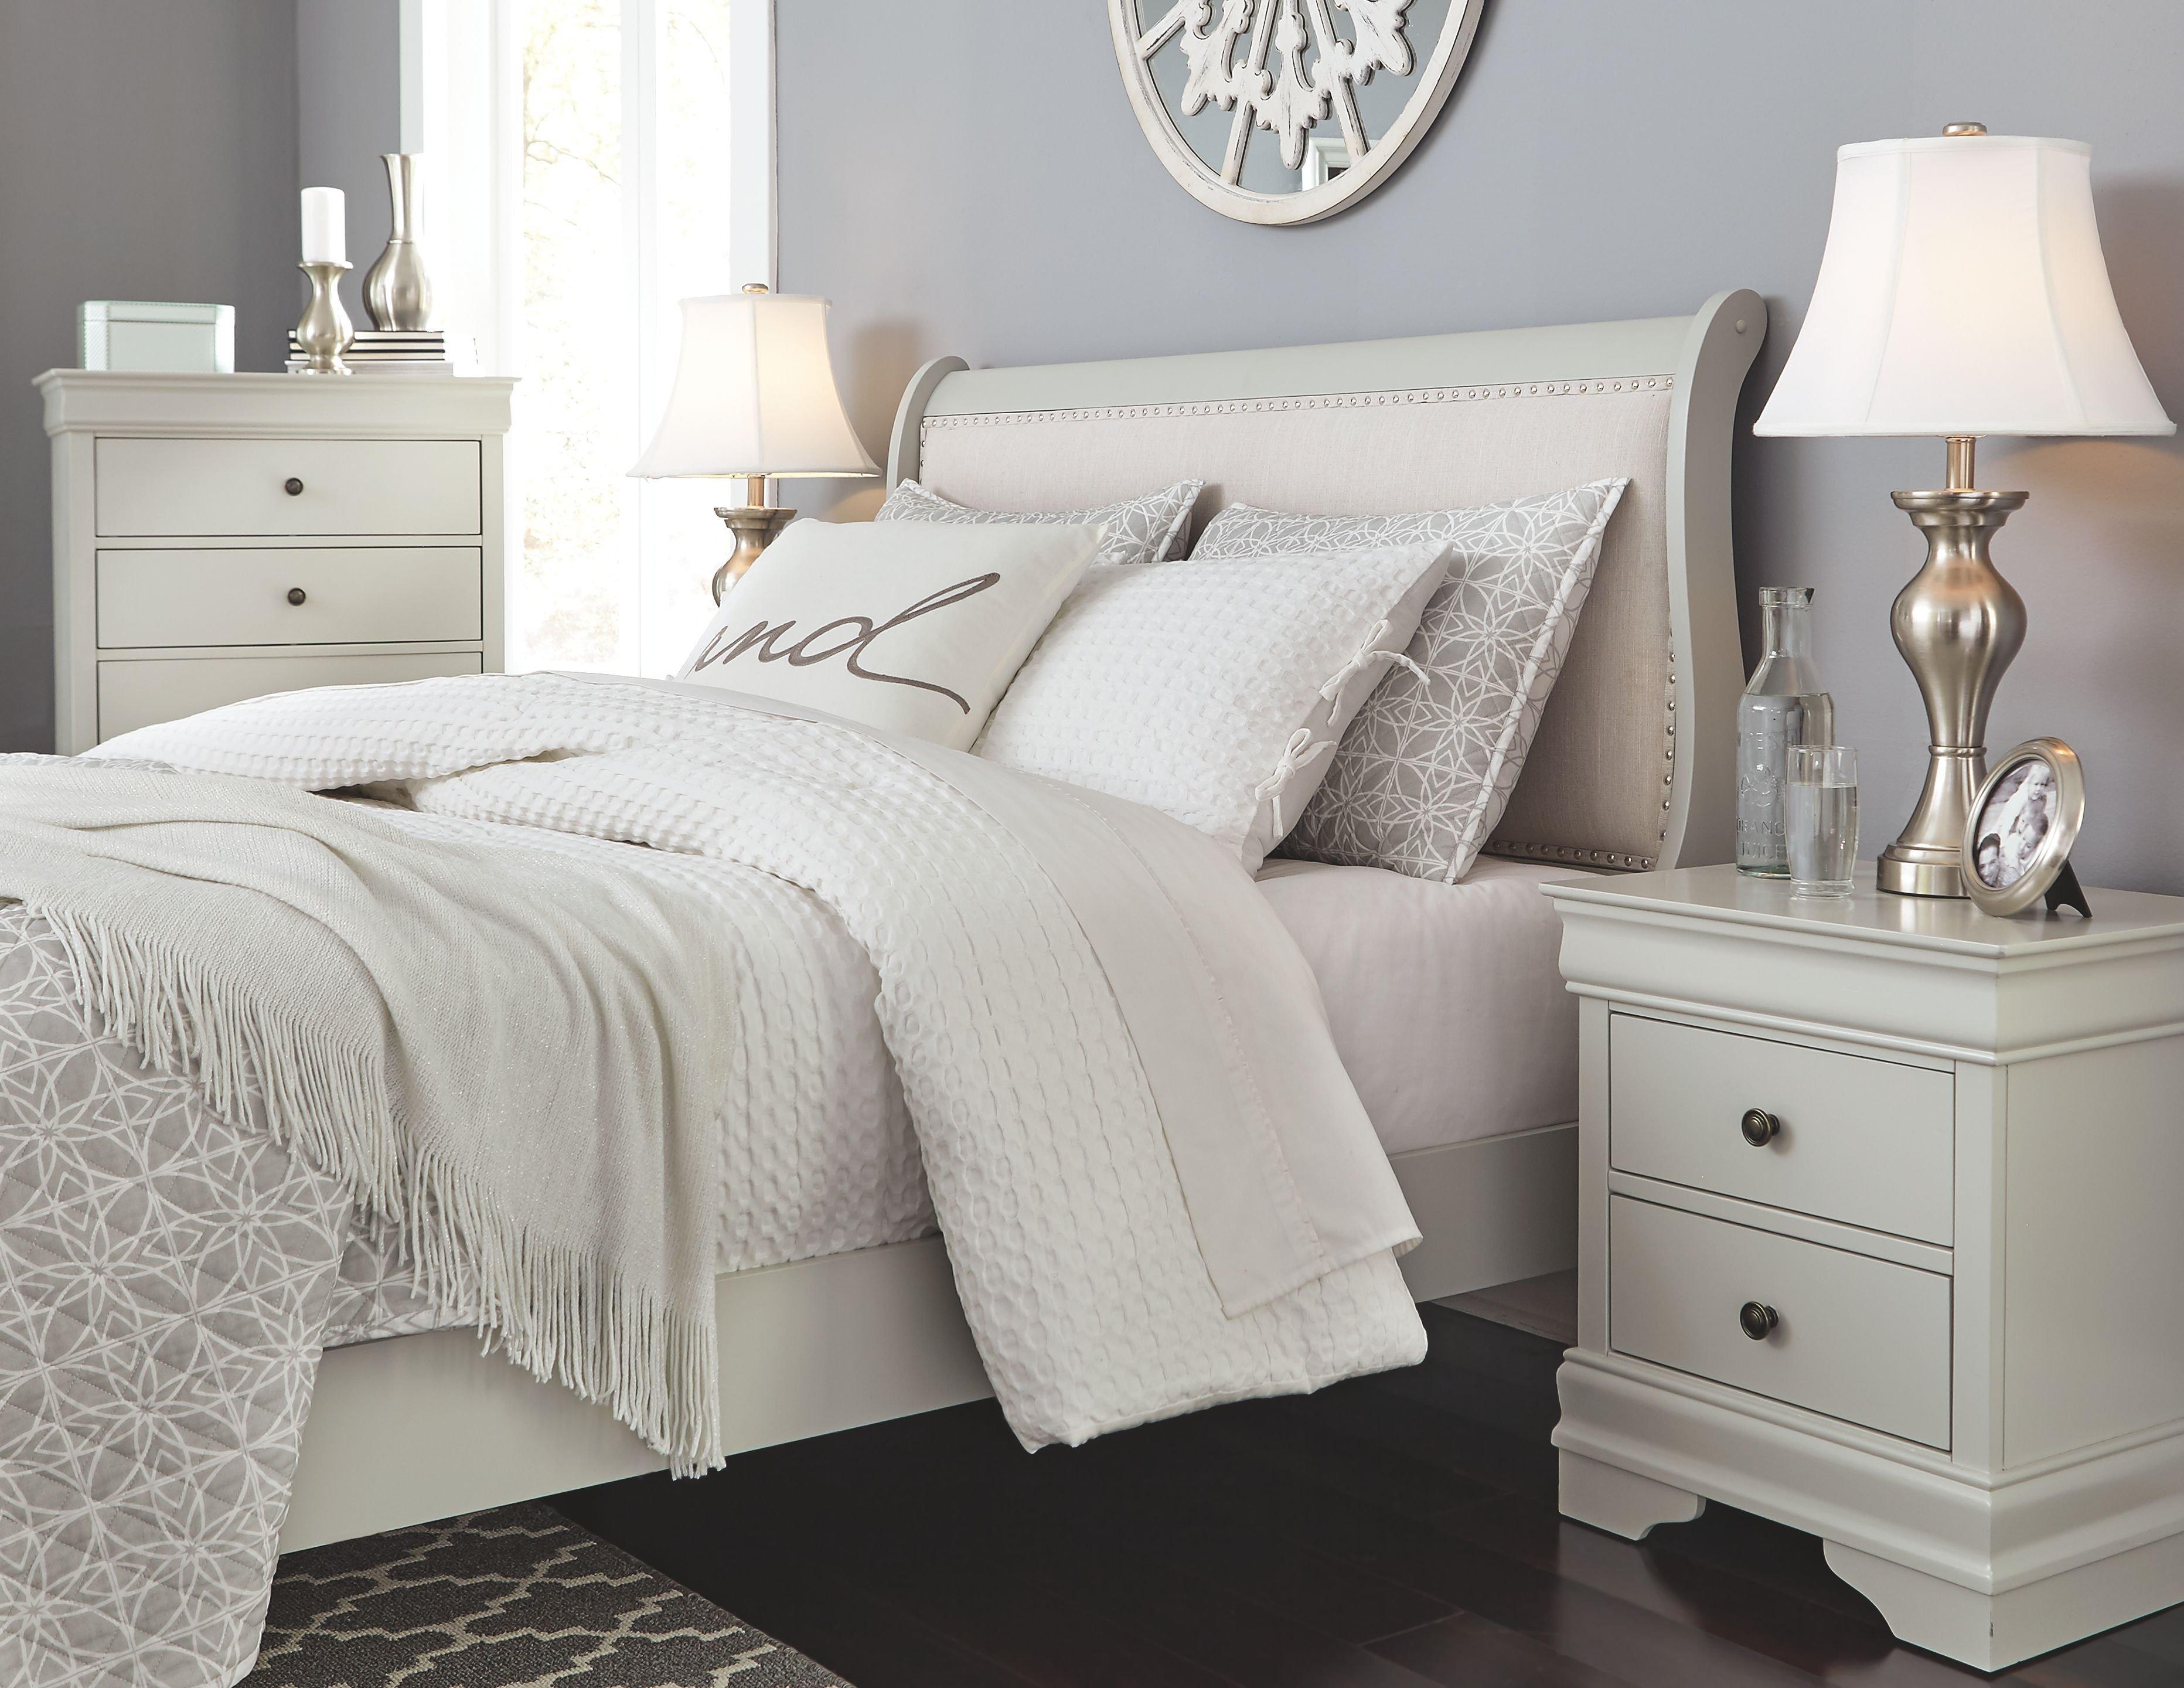 White Washed Bedroom Furniture Set Elegant Jorstad Full Bed with 2 Nightstands Gray